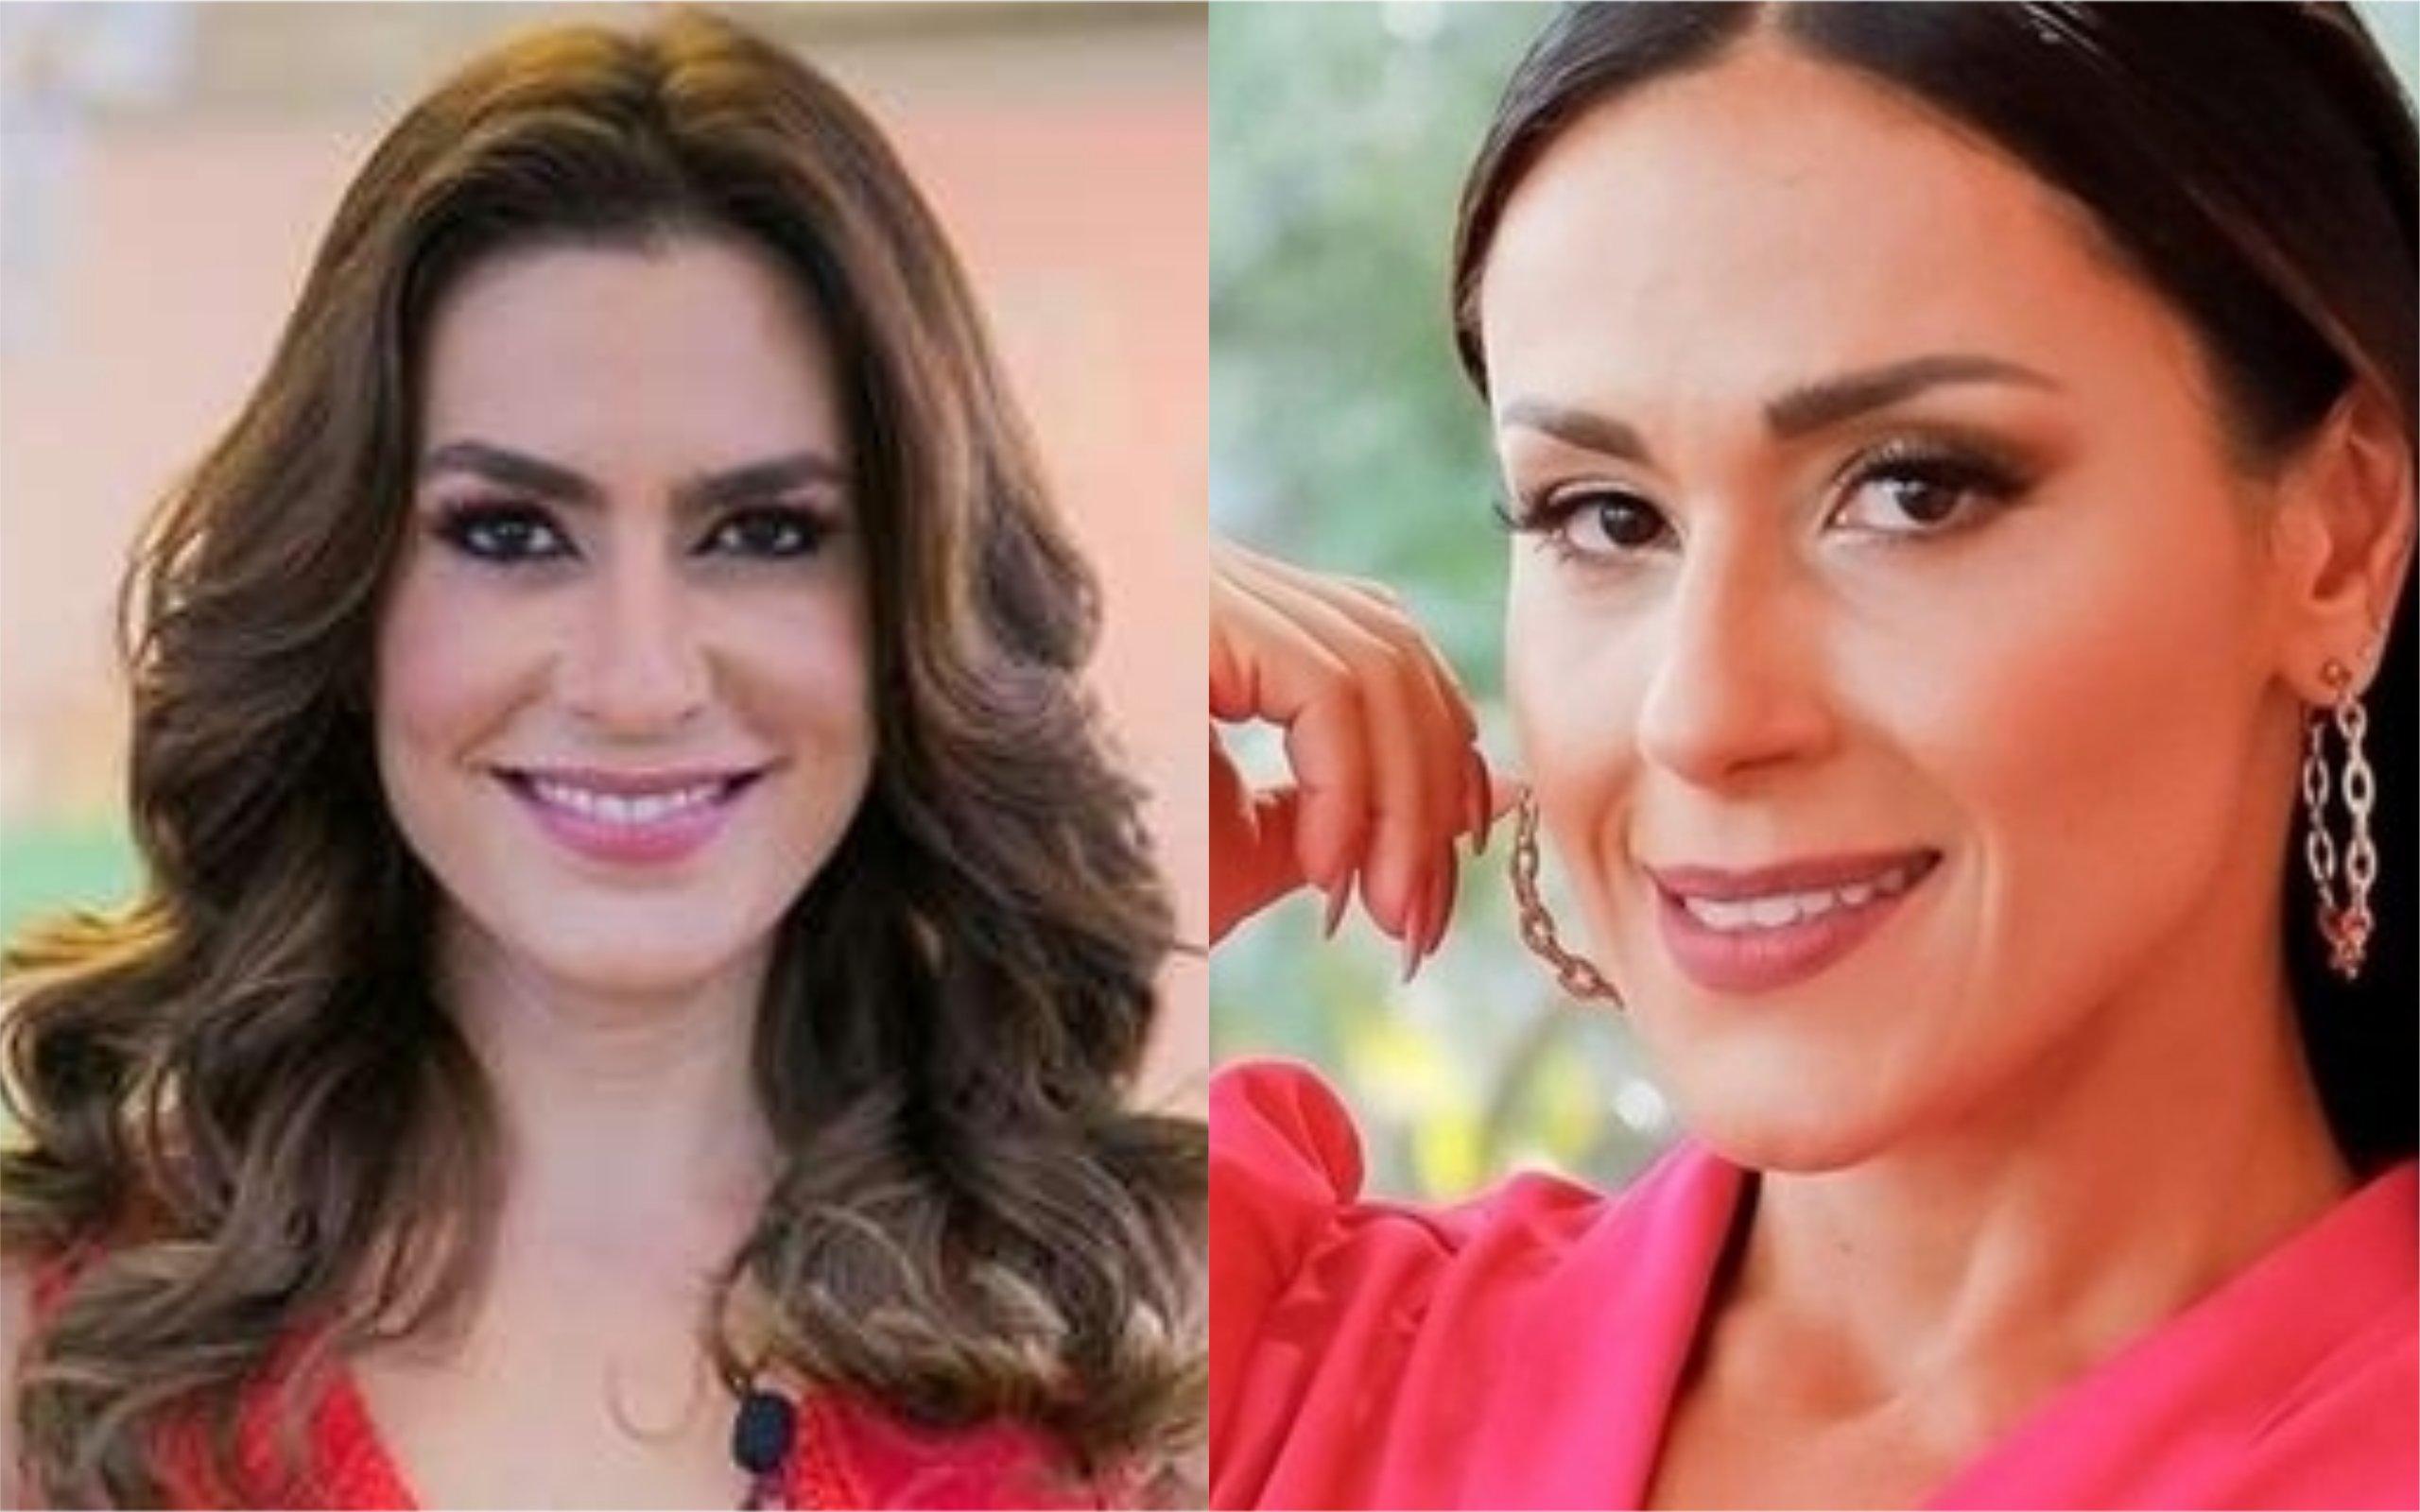 Ticiana Villas Boas e Nadja Haddad (Foto: Divulgação)